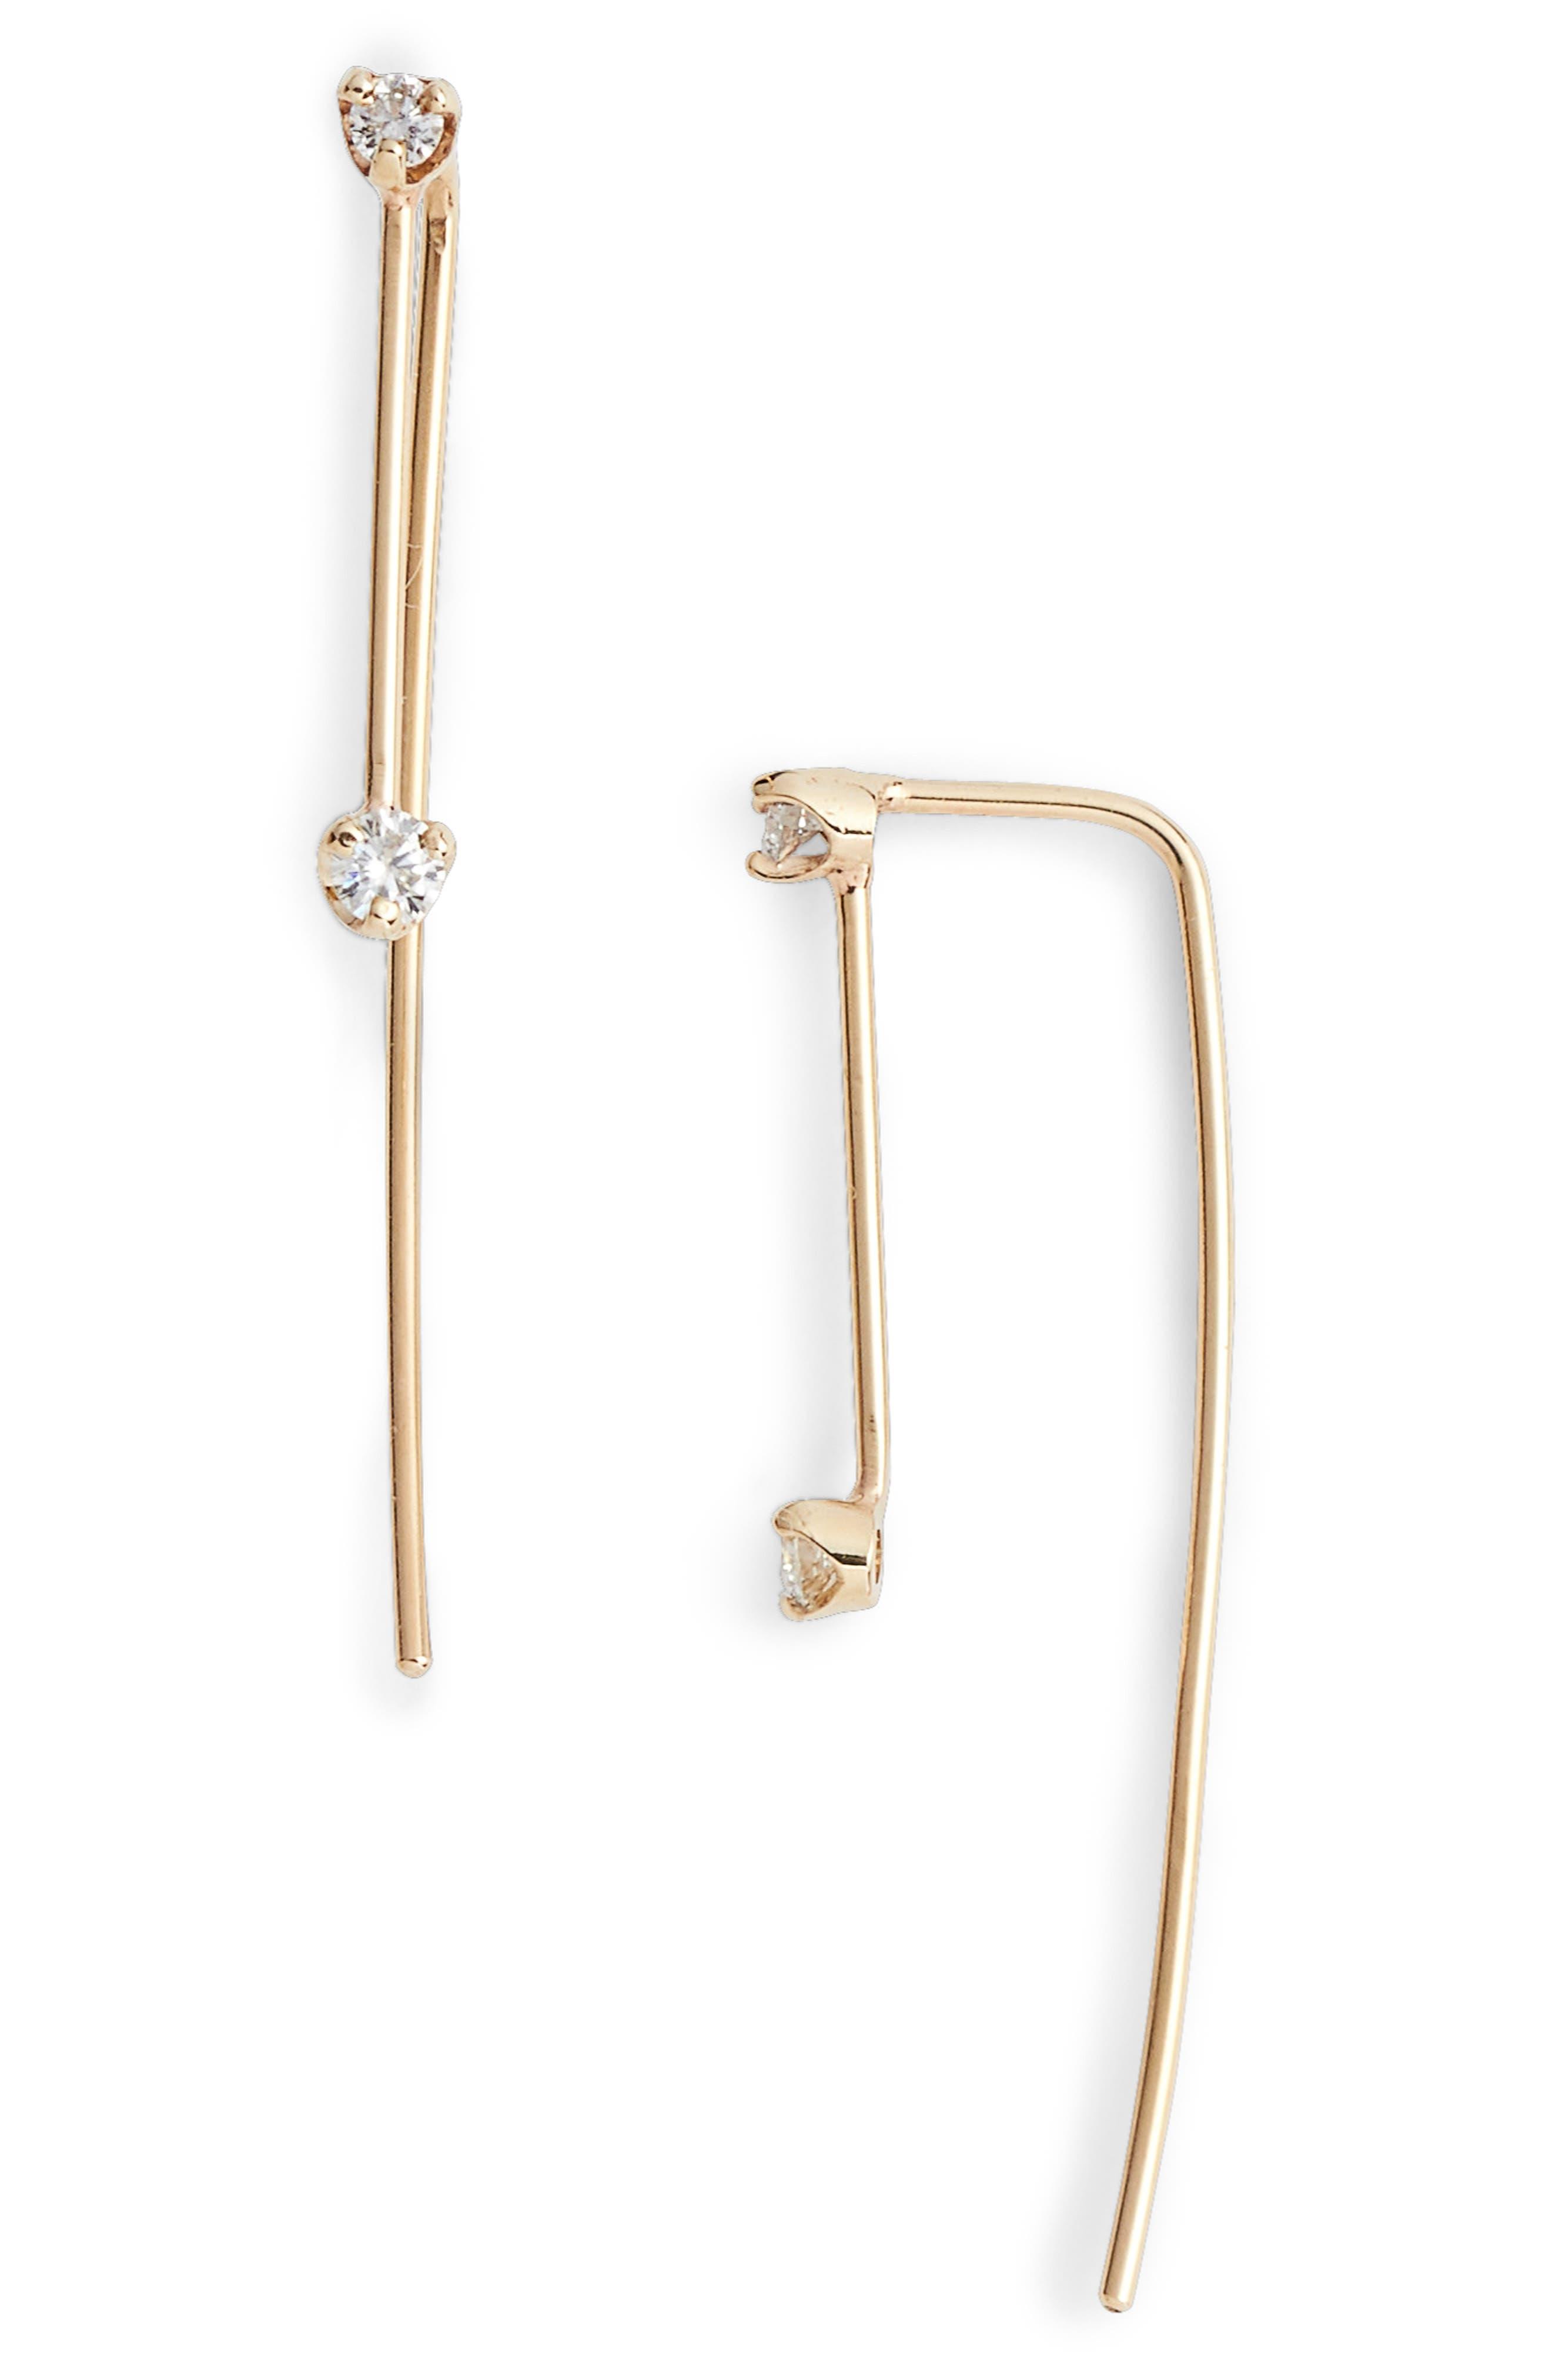 Double Diamond Threader Earrings,                         Main,                         color, YELLOW GOLD